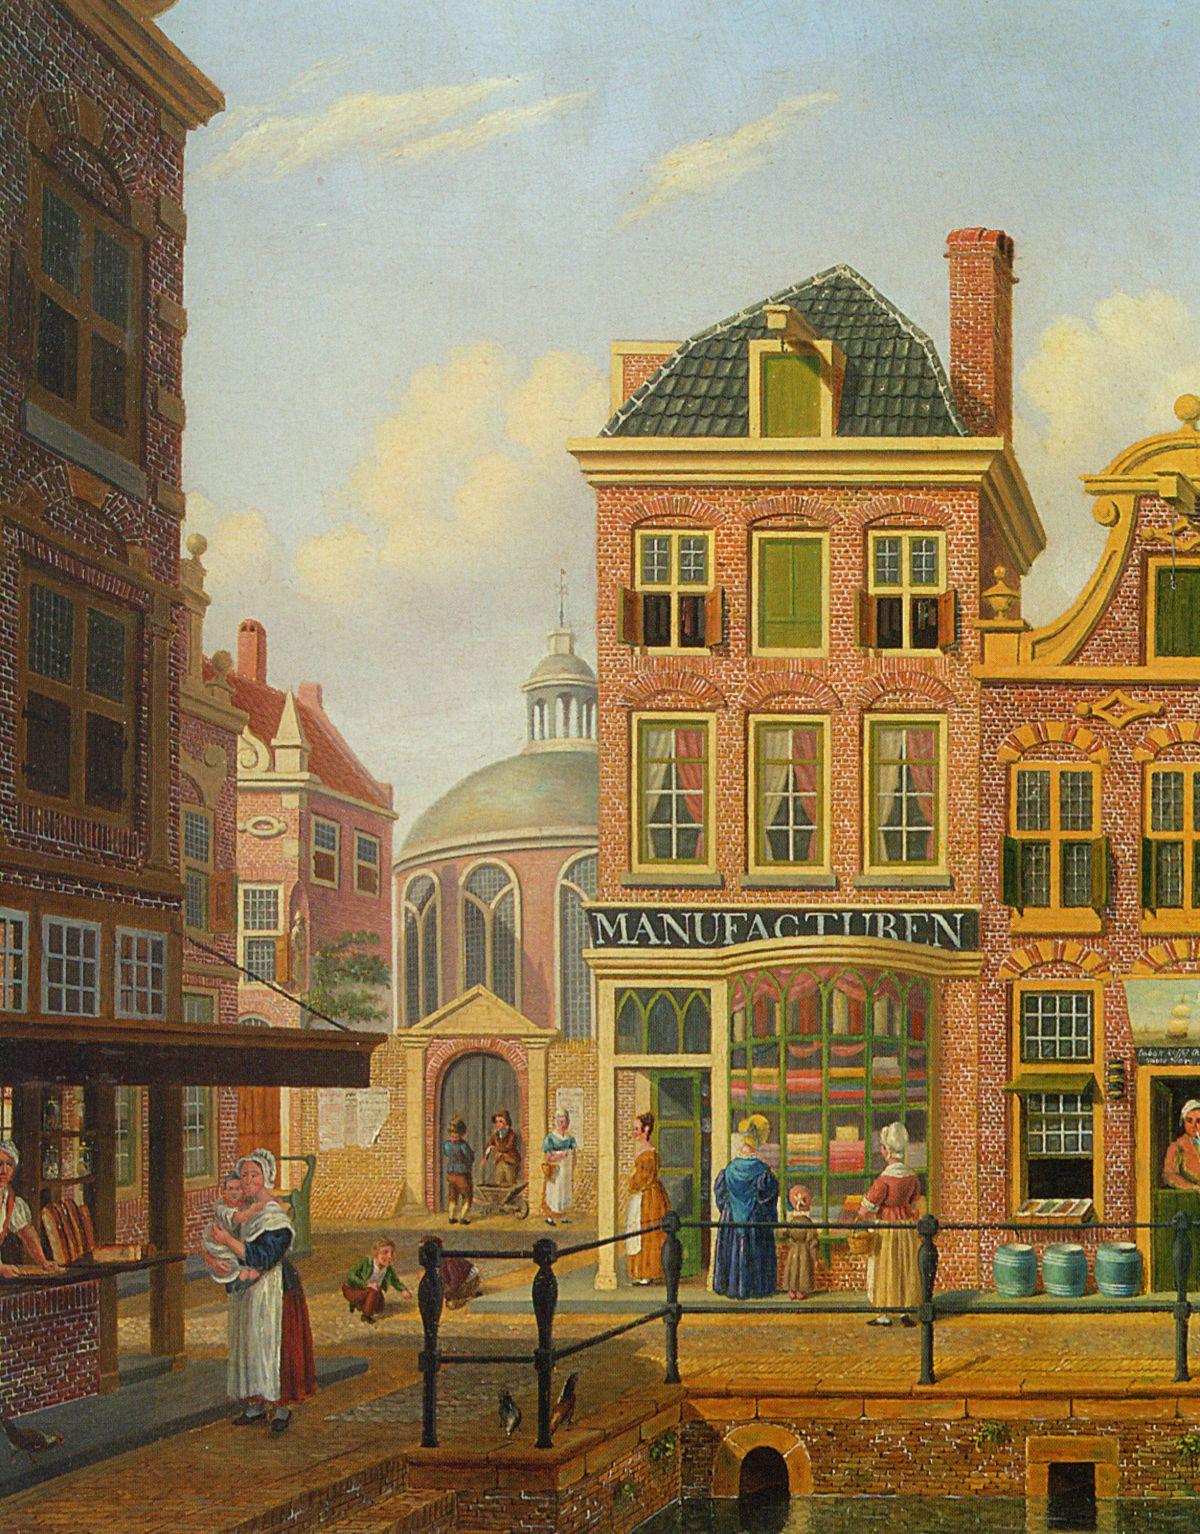 A Capriccio View in Amsterdam by Jan Hendrik Verheijen